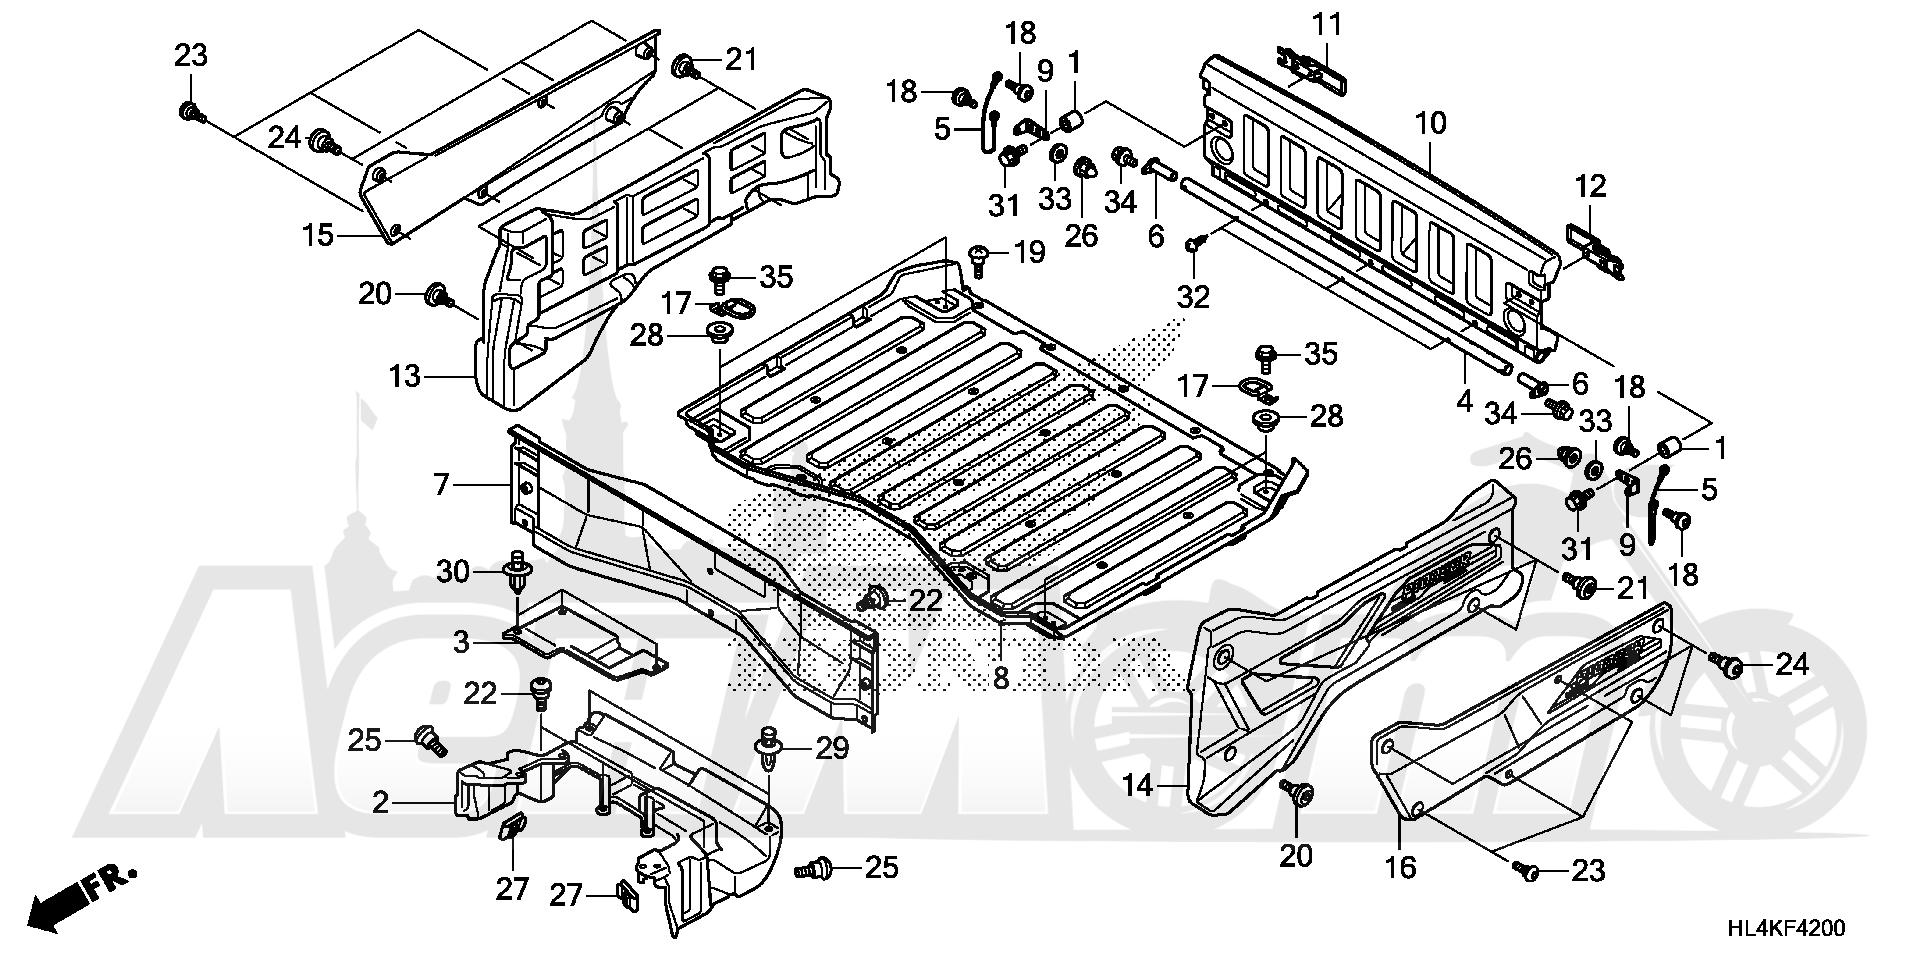 Запчасти для Квадроцикла Honda 2019 SXS1000M5D Раздел: BED PLATE AND REAR GATE (1) | BED пластина и зад GATE (1)